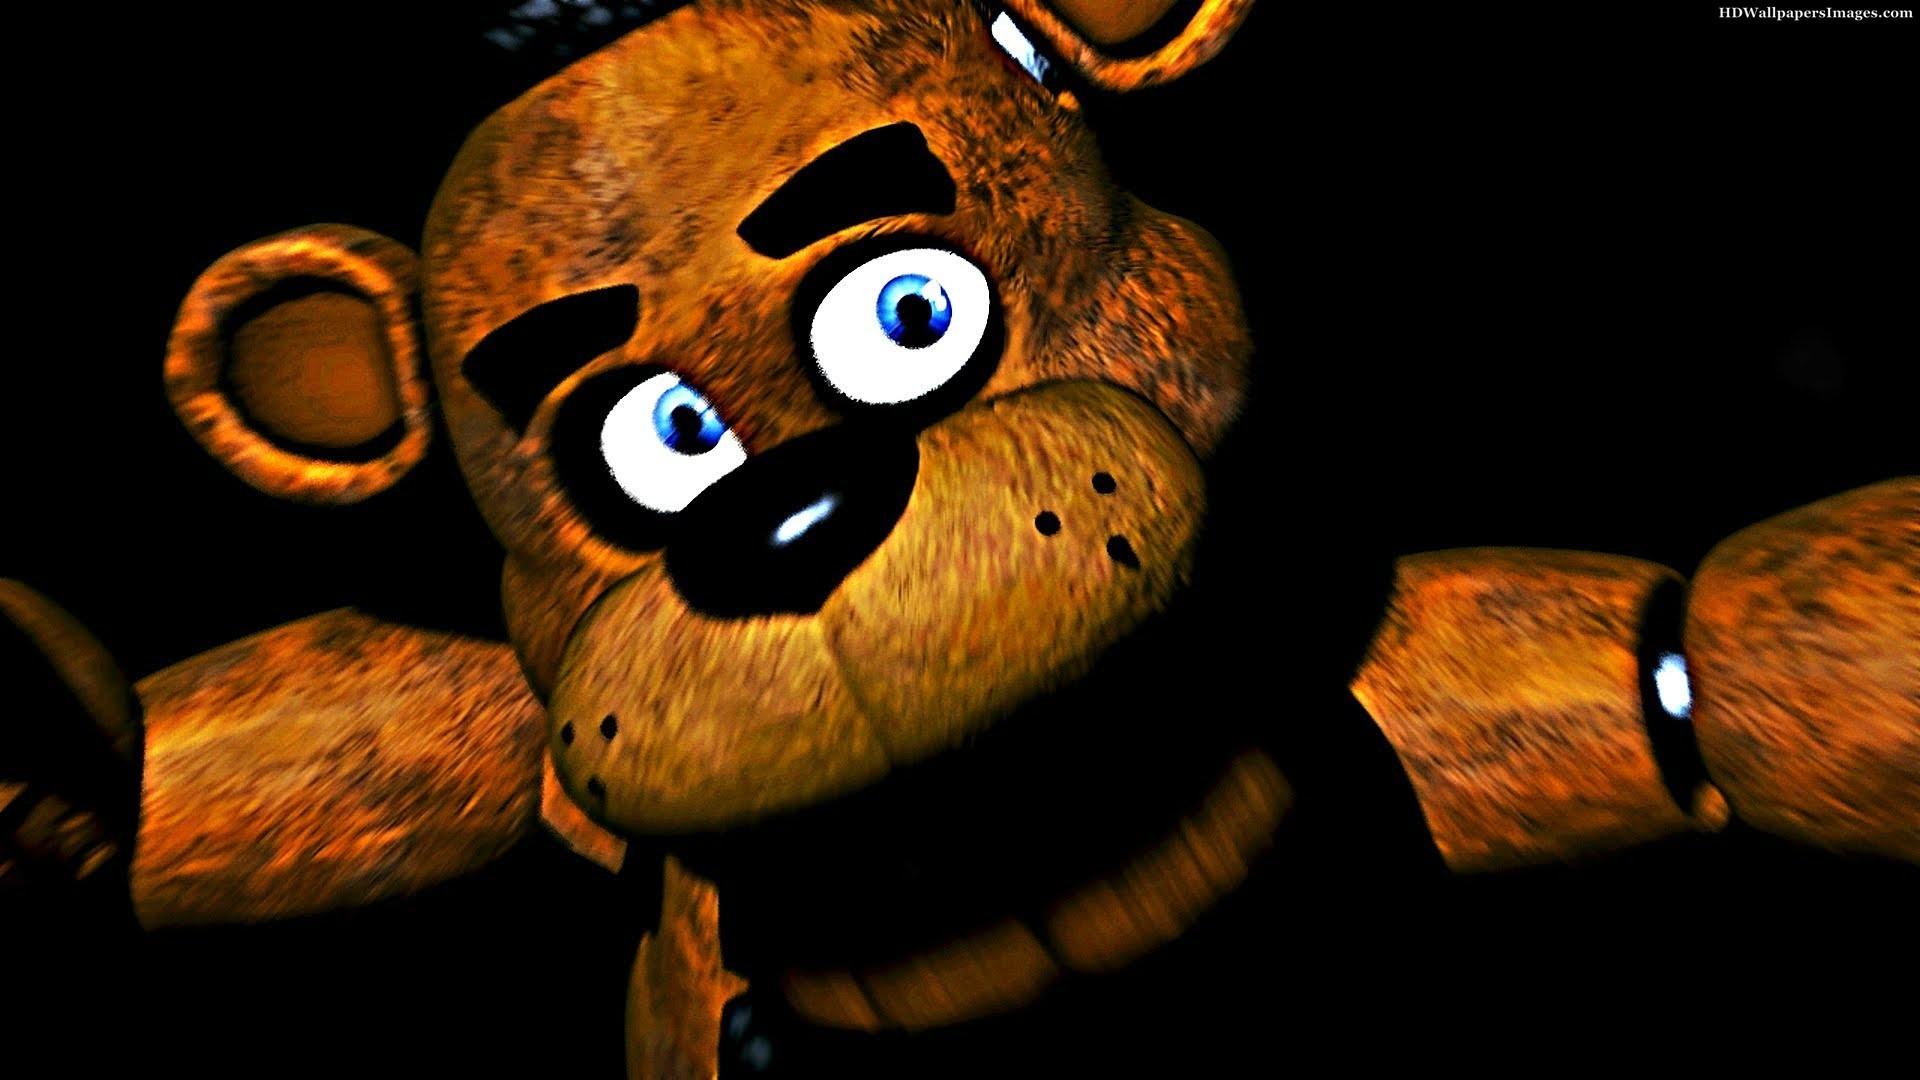 Wallpaper Animals Video Games Stuffed Animal Five Nights At